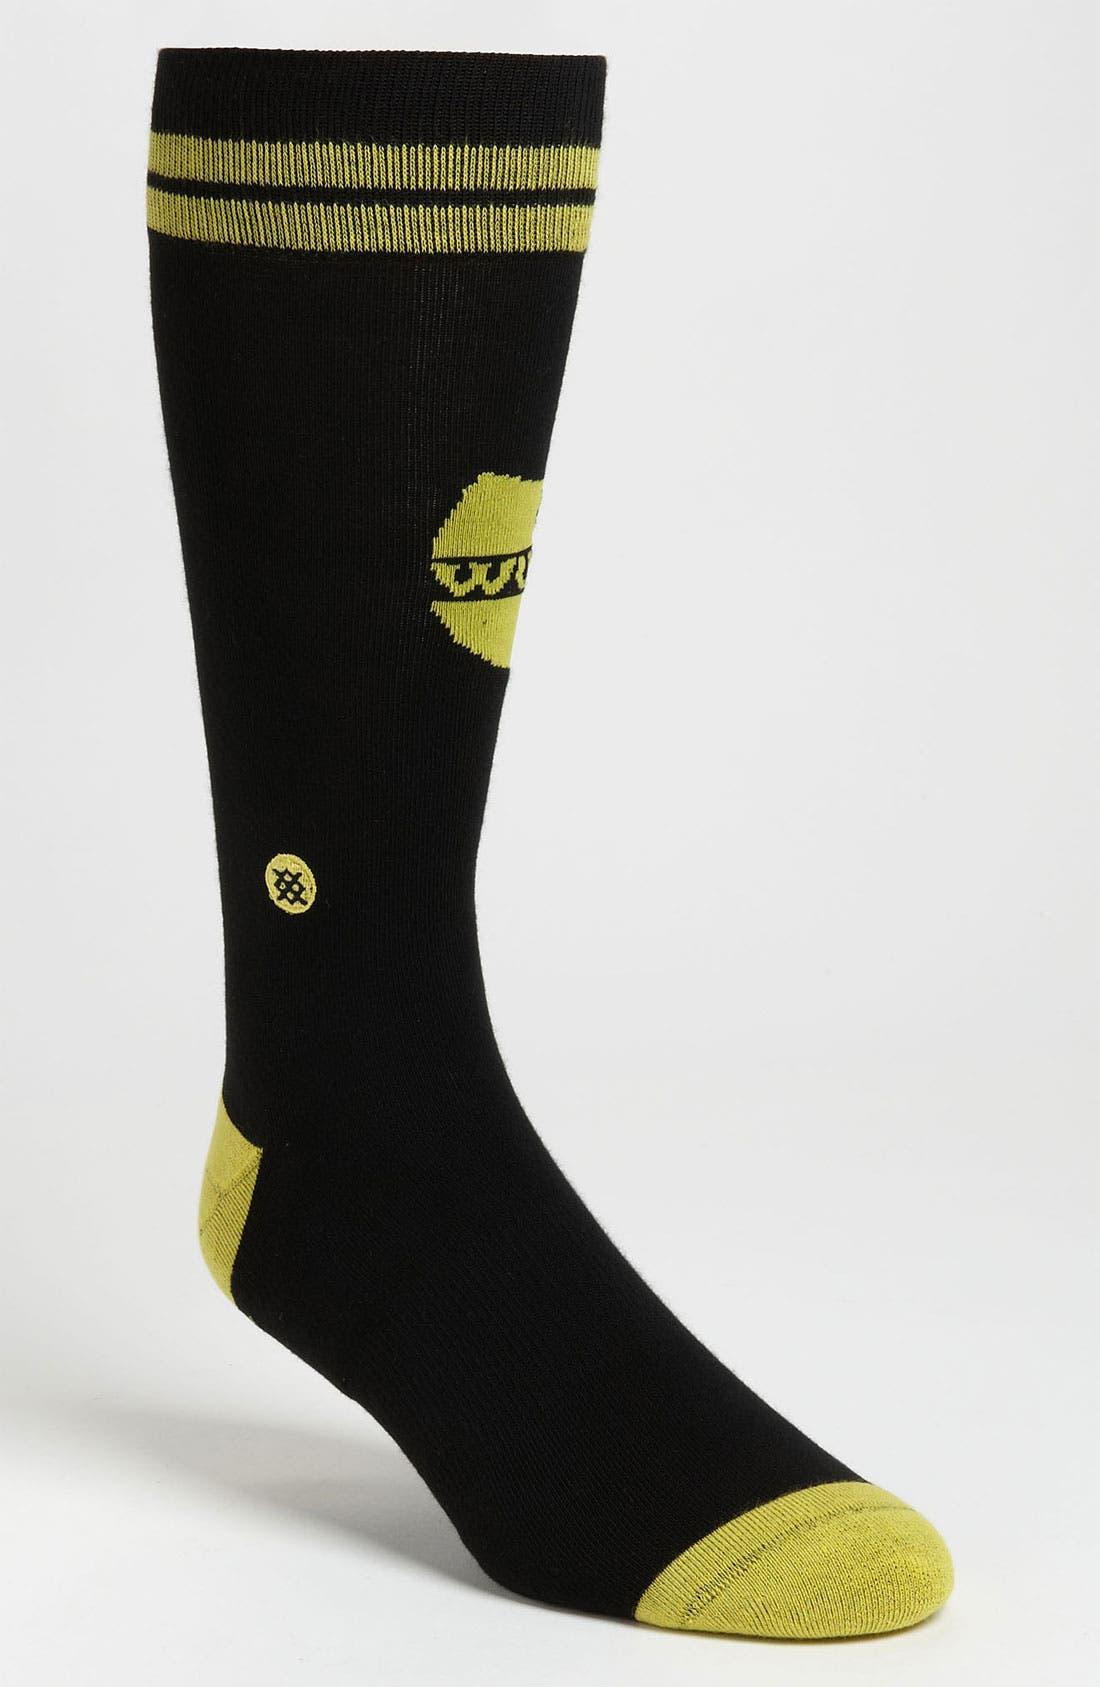 Main Image - Stance 'Wu Tang' Socks